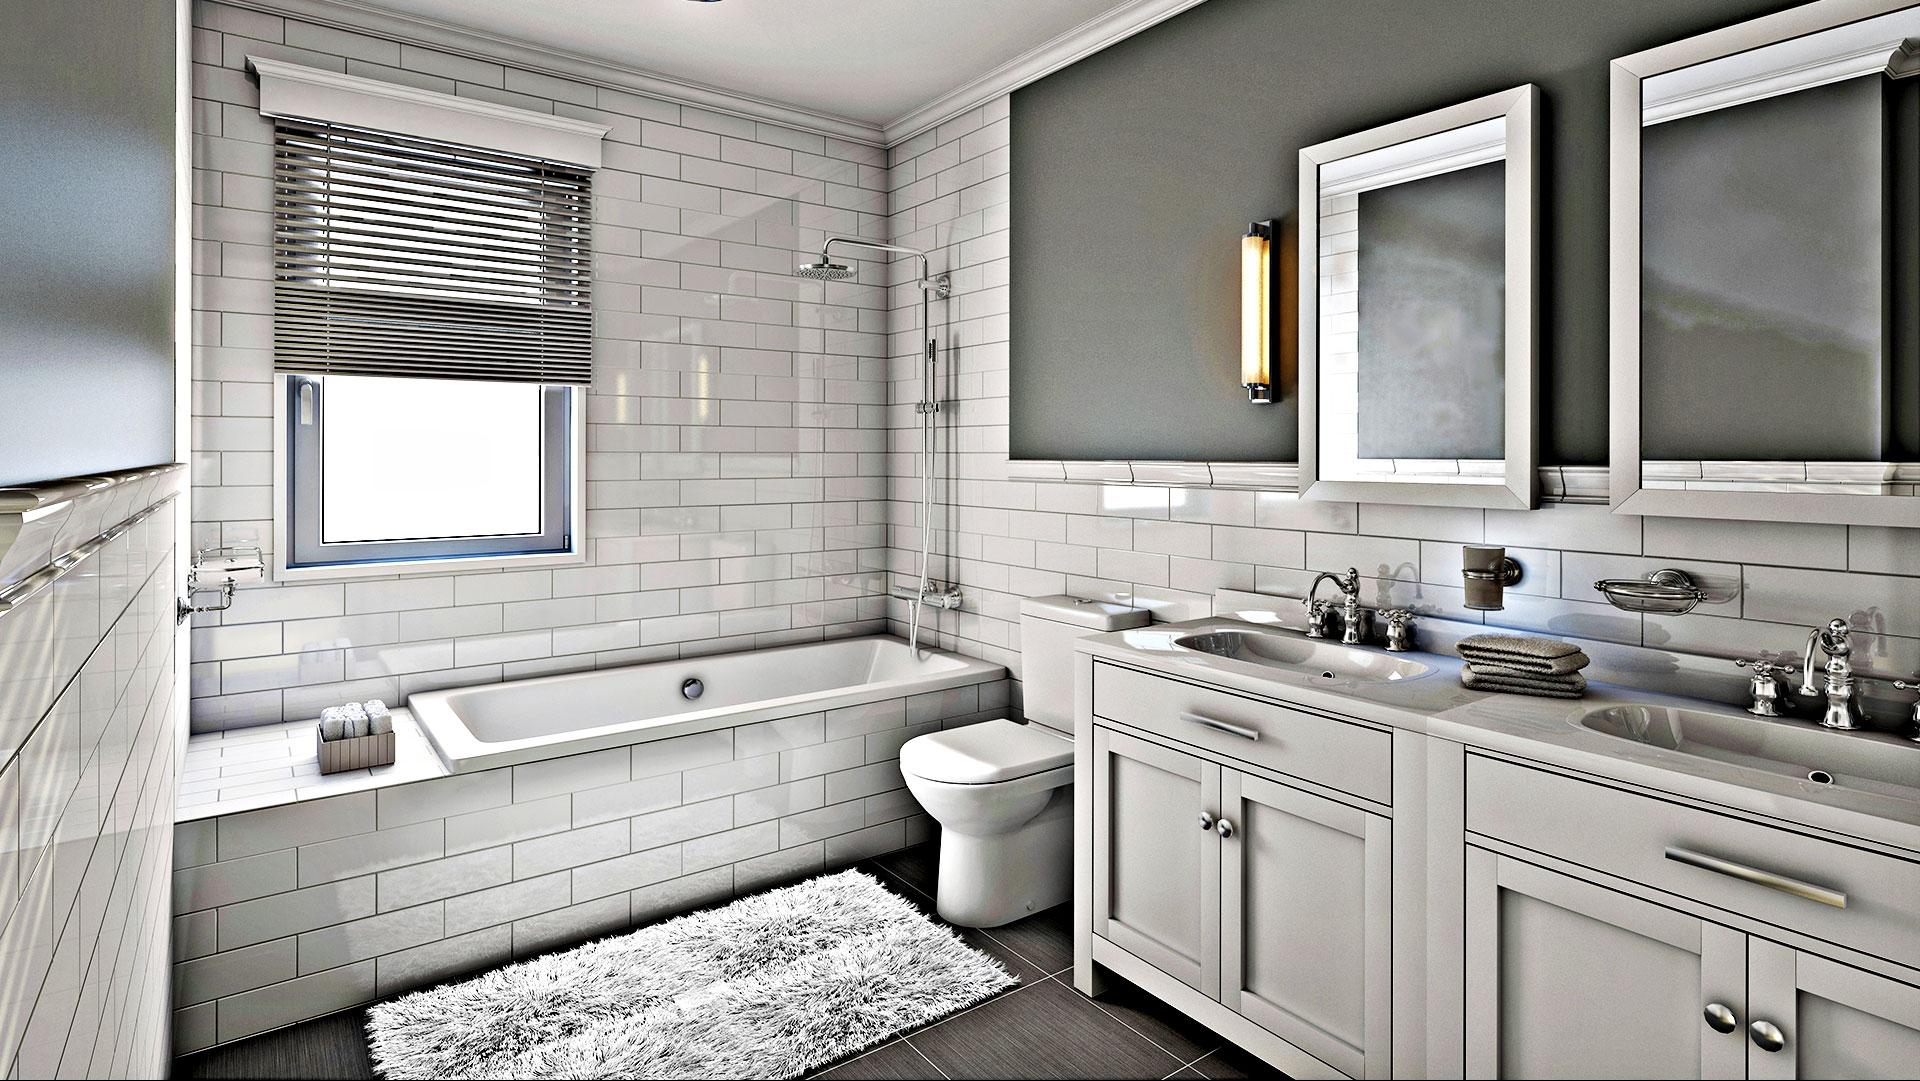 RK Construction Group LLC Remodeled Bathroom